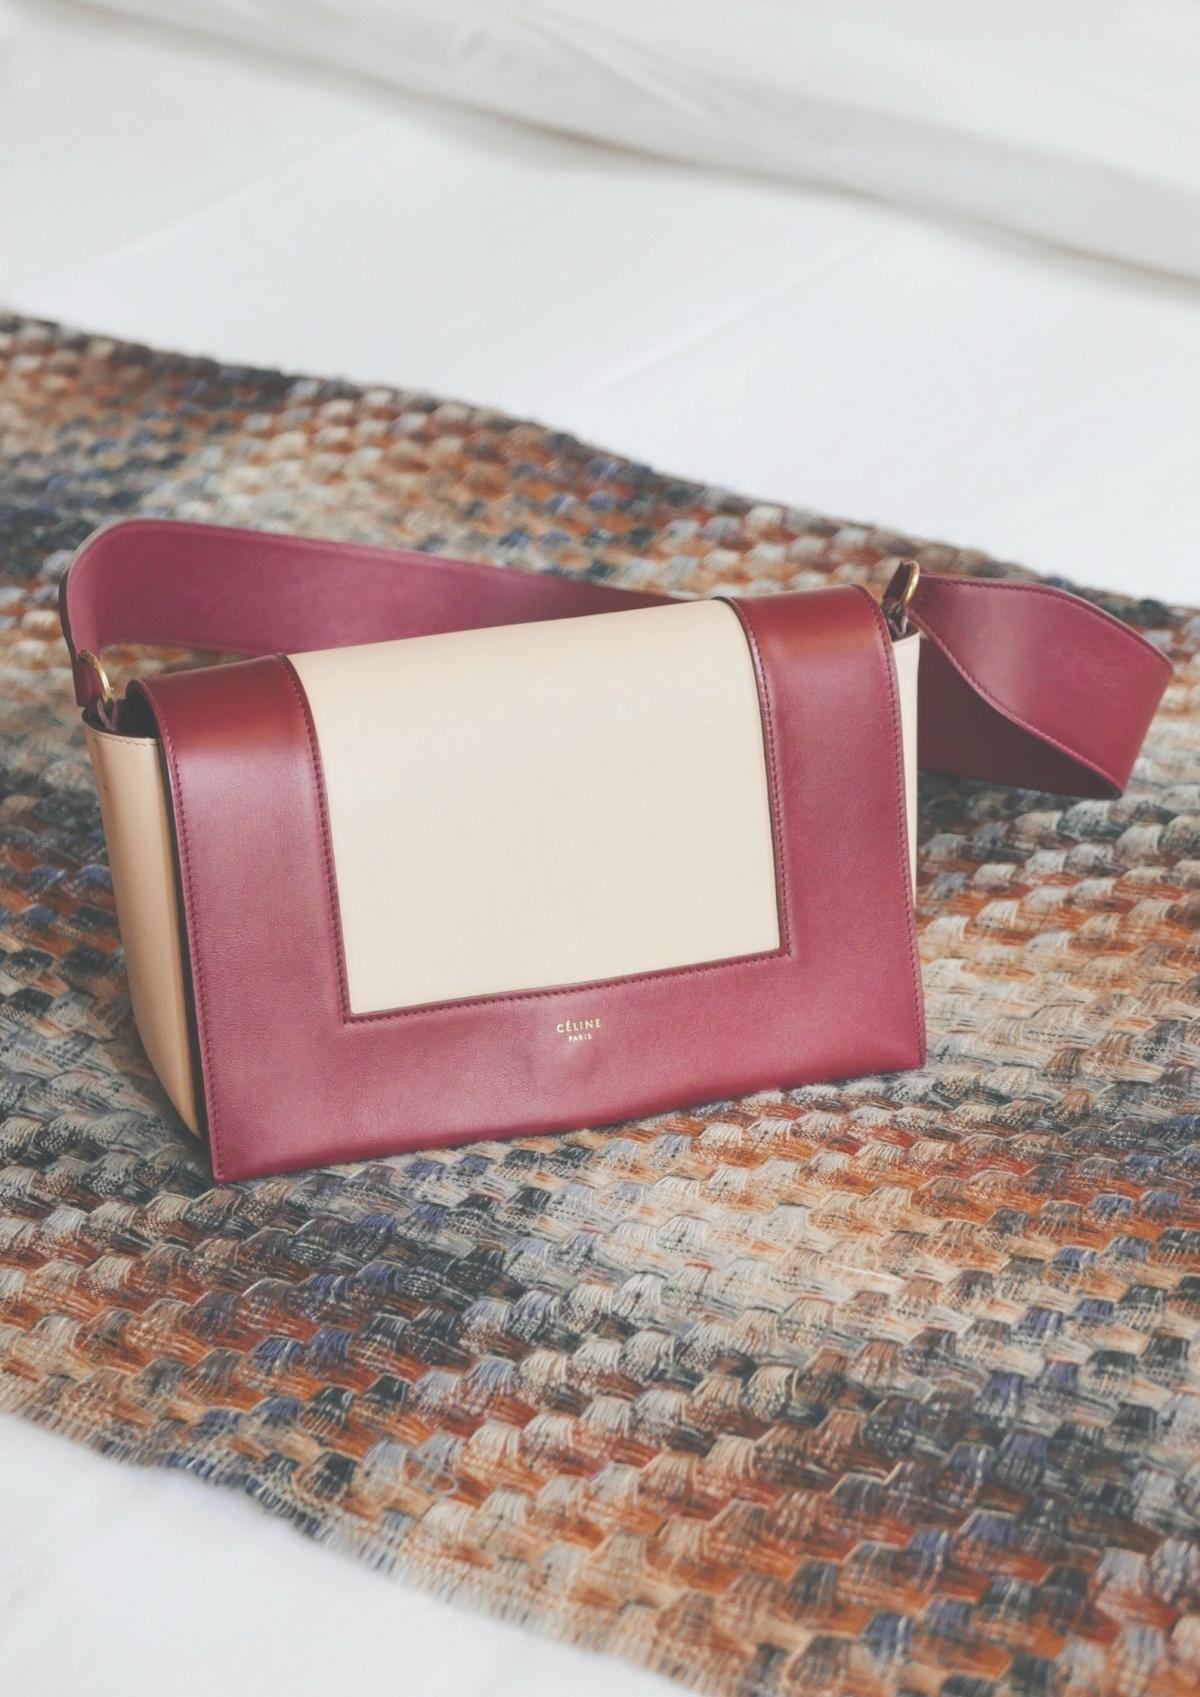 CÉLINE Frame Bag